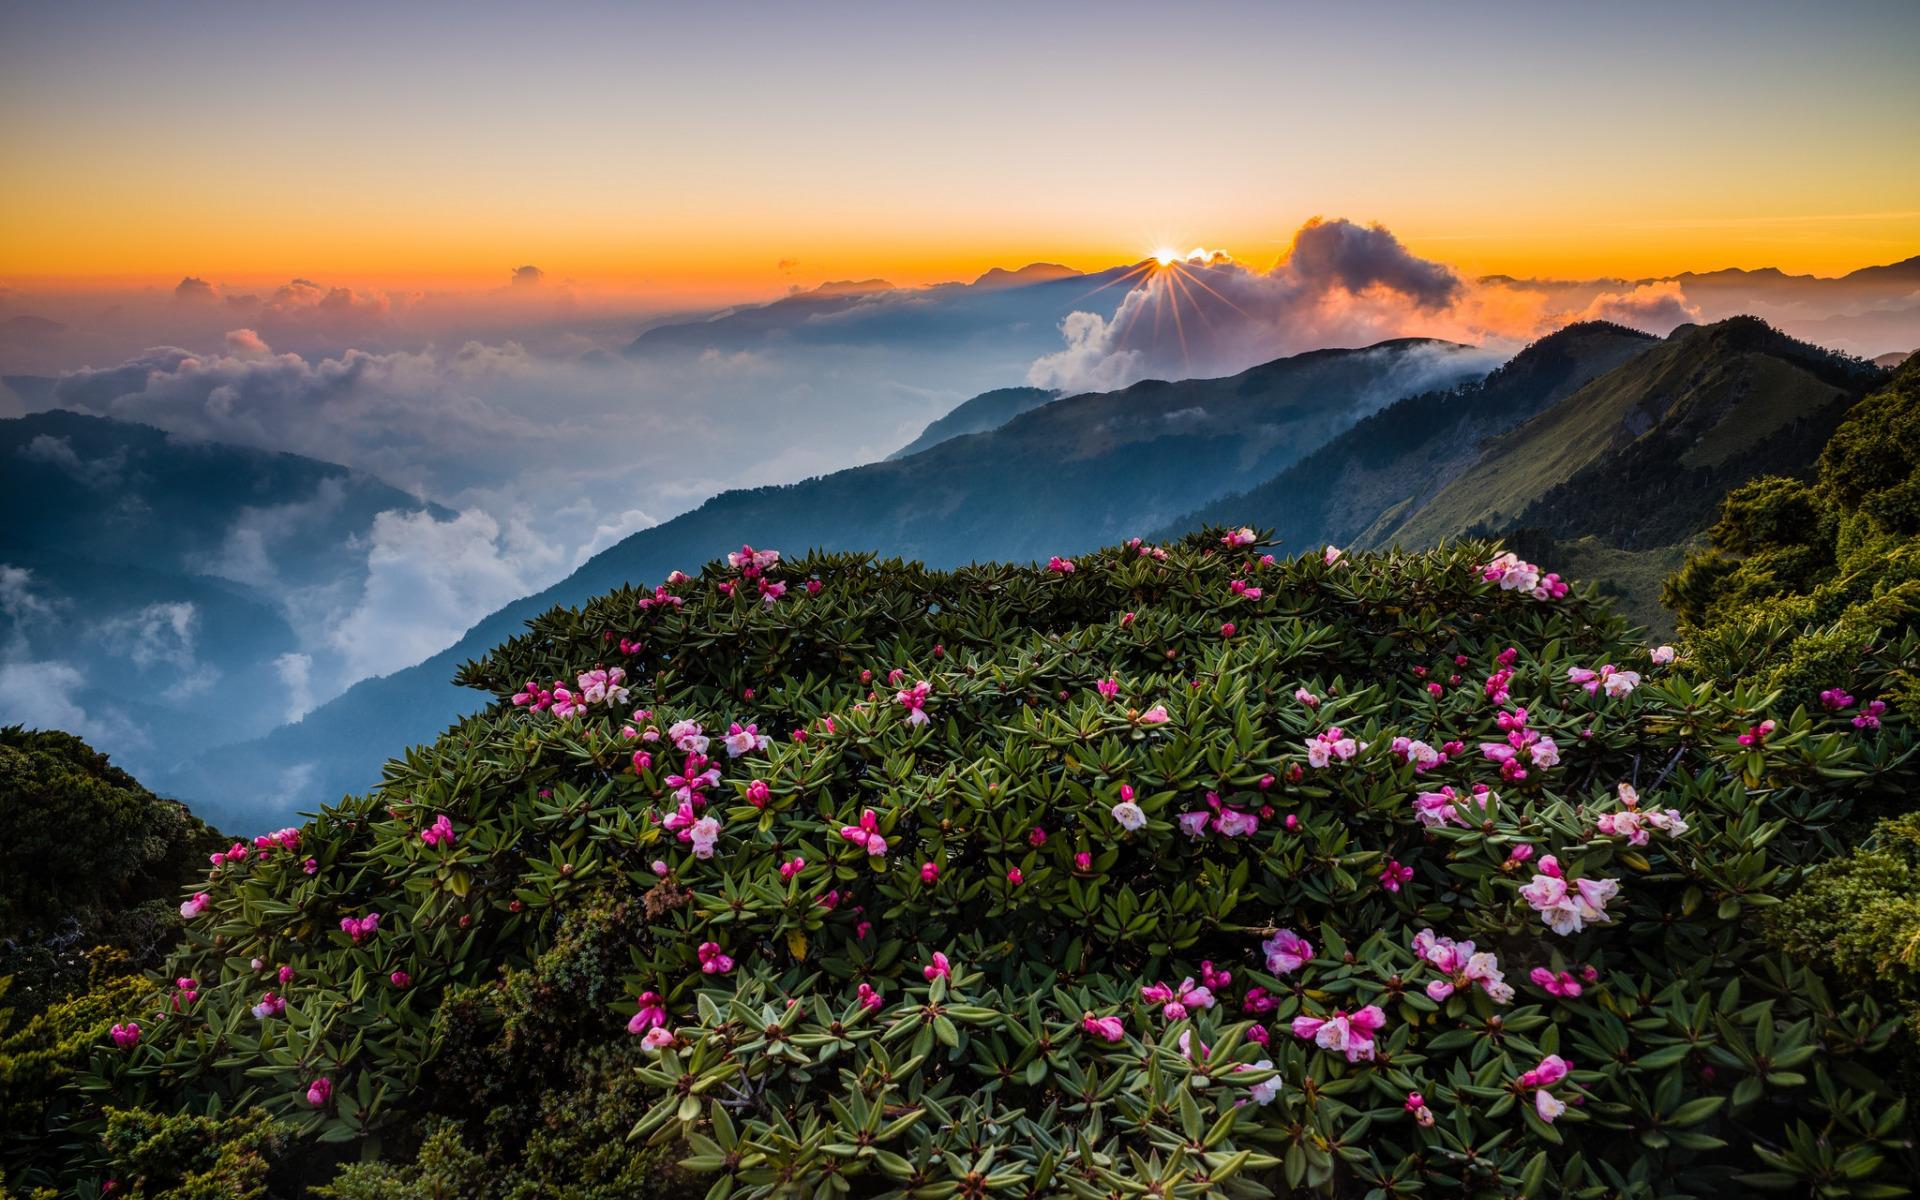 Картинка: Склон, небо, холм, горы, цветы, зелень, облака, закат